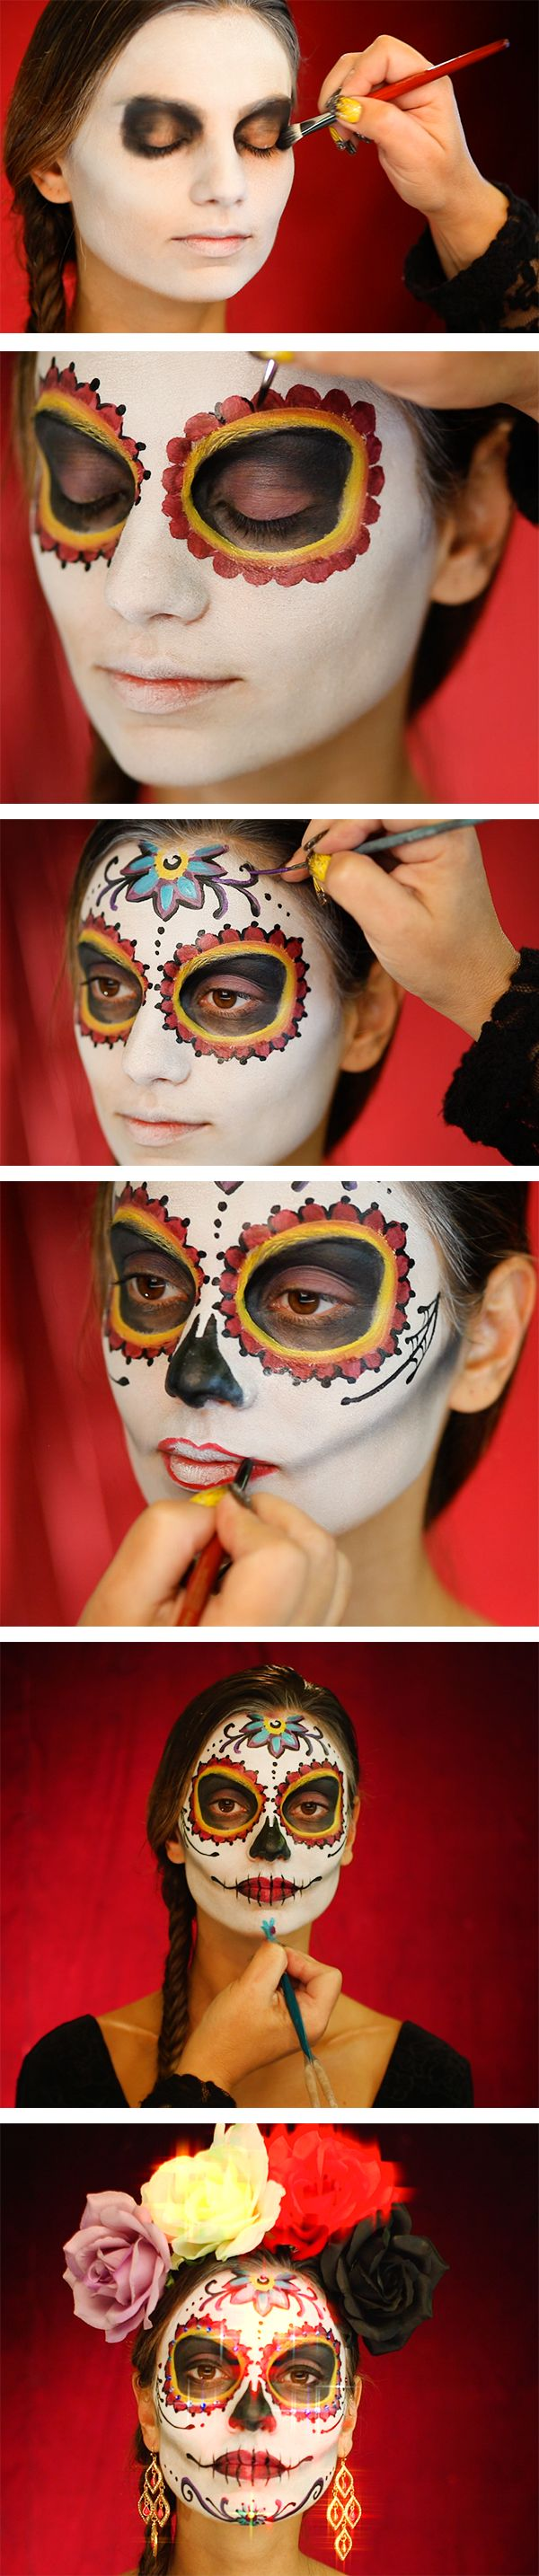 25 super cool step by step makeup tutorials for halloween hative sugar skull makeup tutorial baditri Images